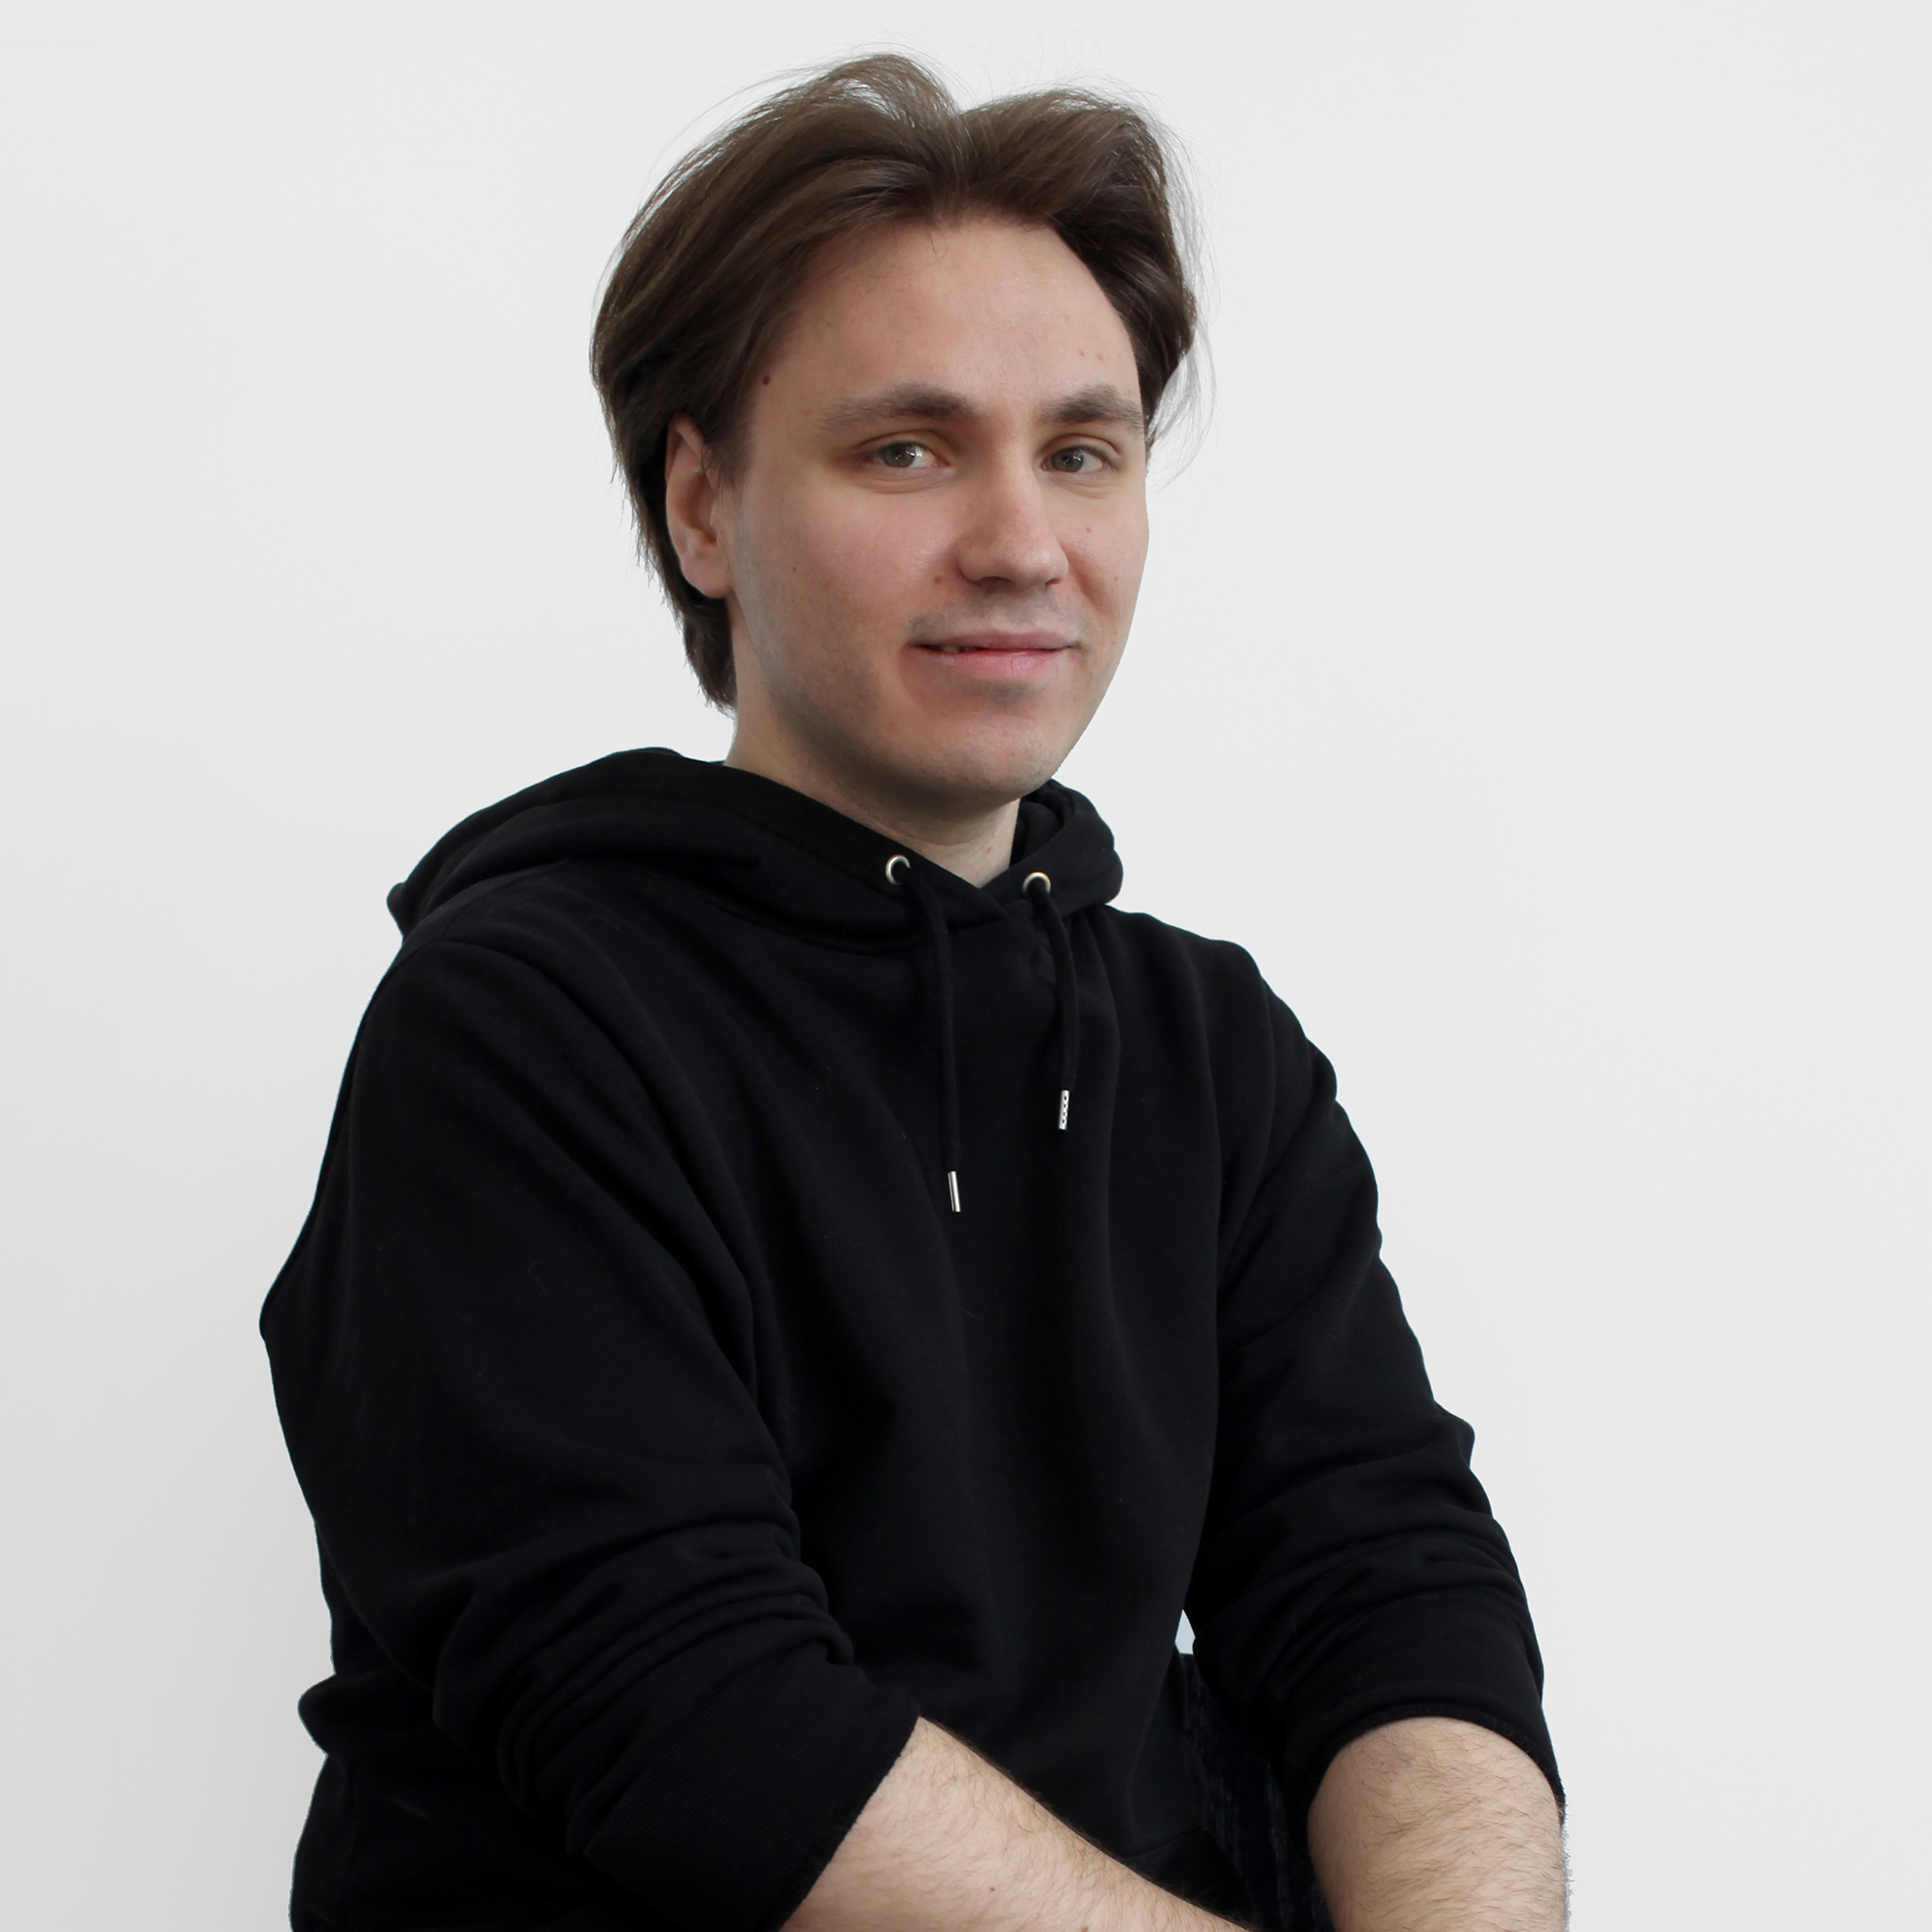 Арсений Андрианов